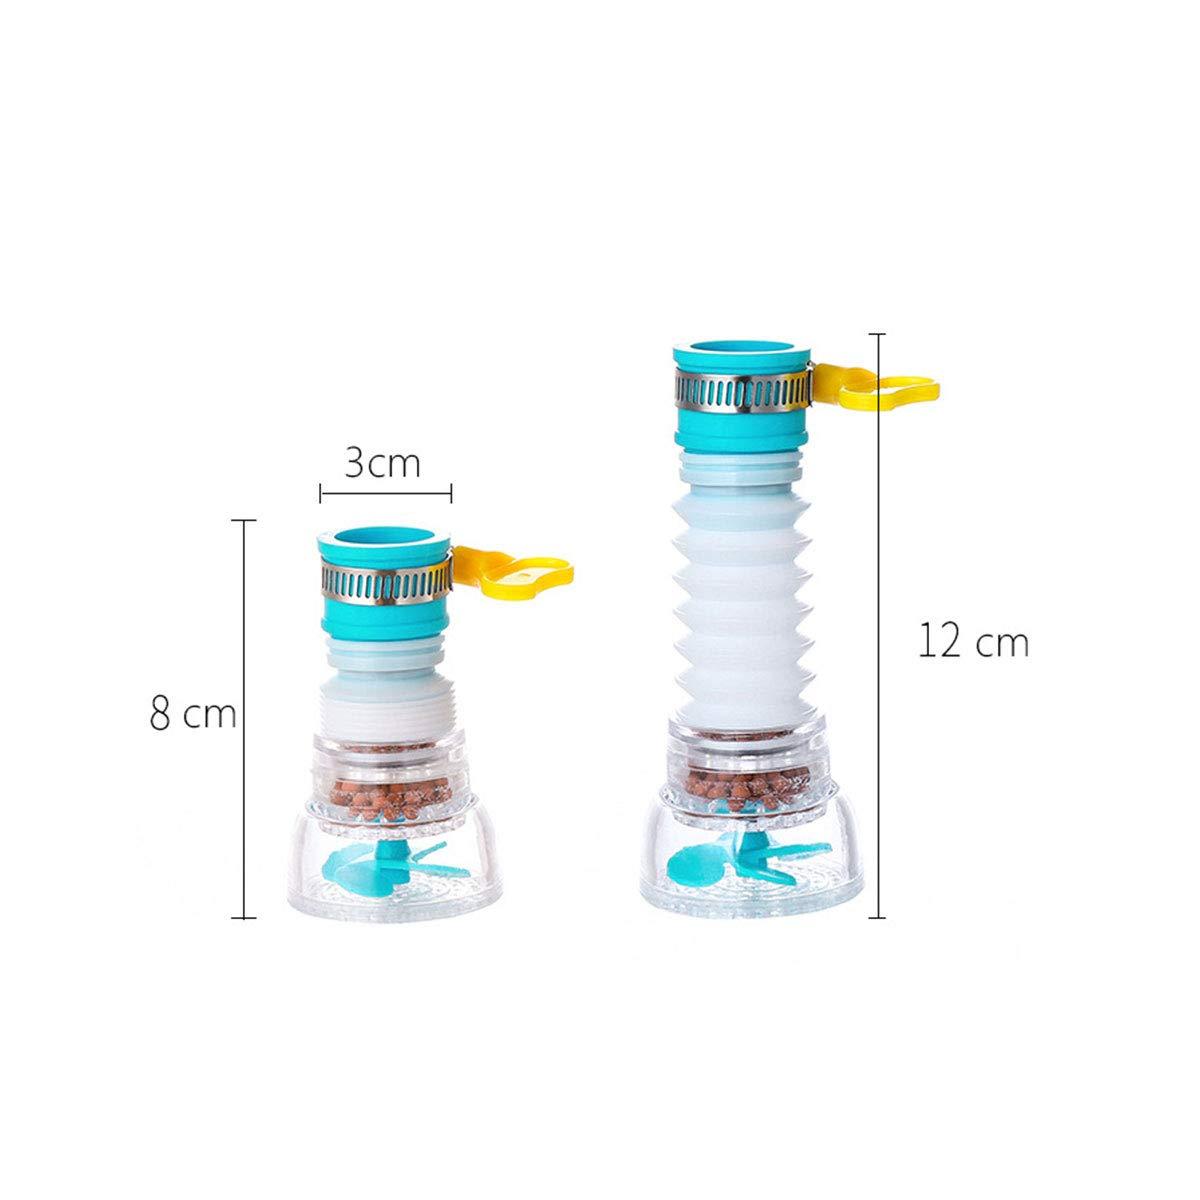 Blue Water Purifier Faucet Kitchen Household Anti Splash Tap Water Filter Cartridge Fits Standard Faucets